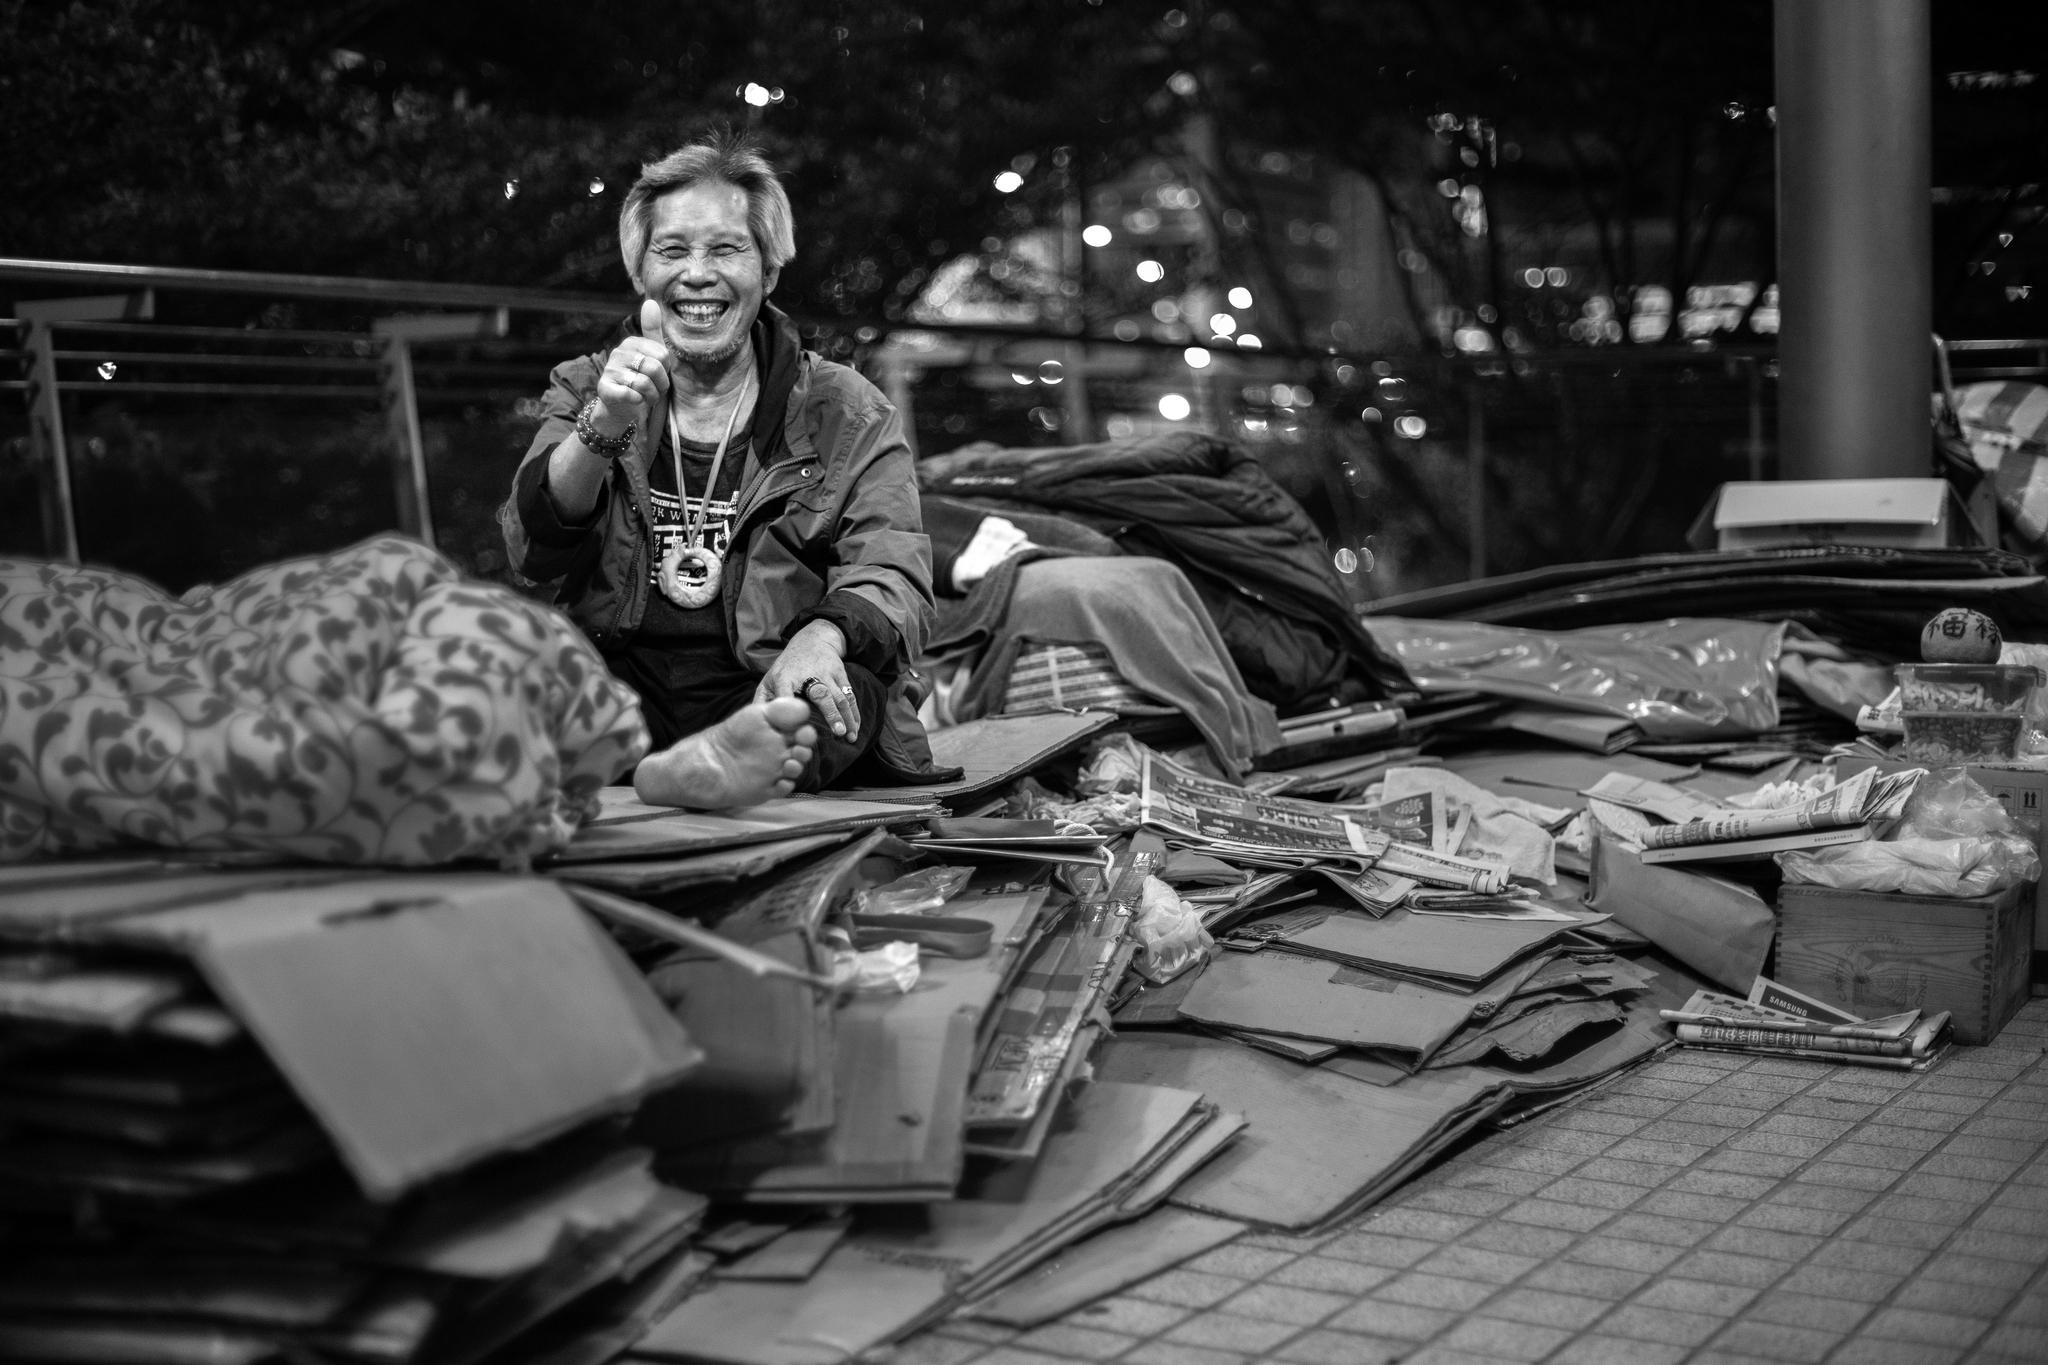 35. Street Life